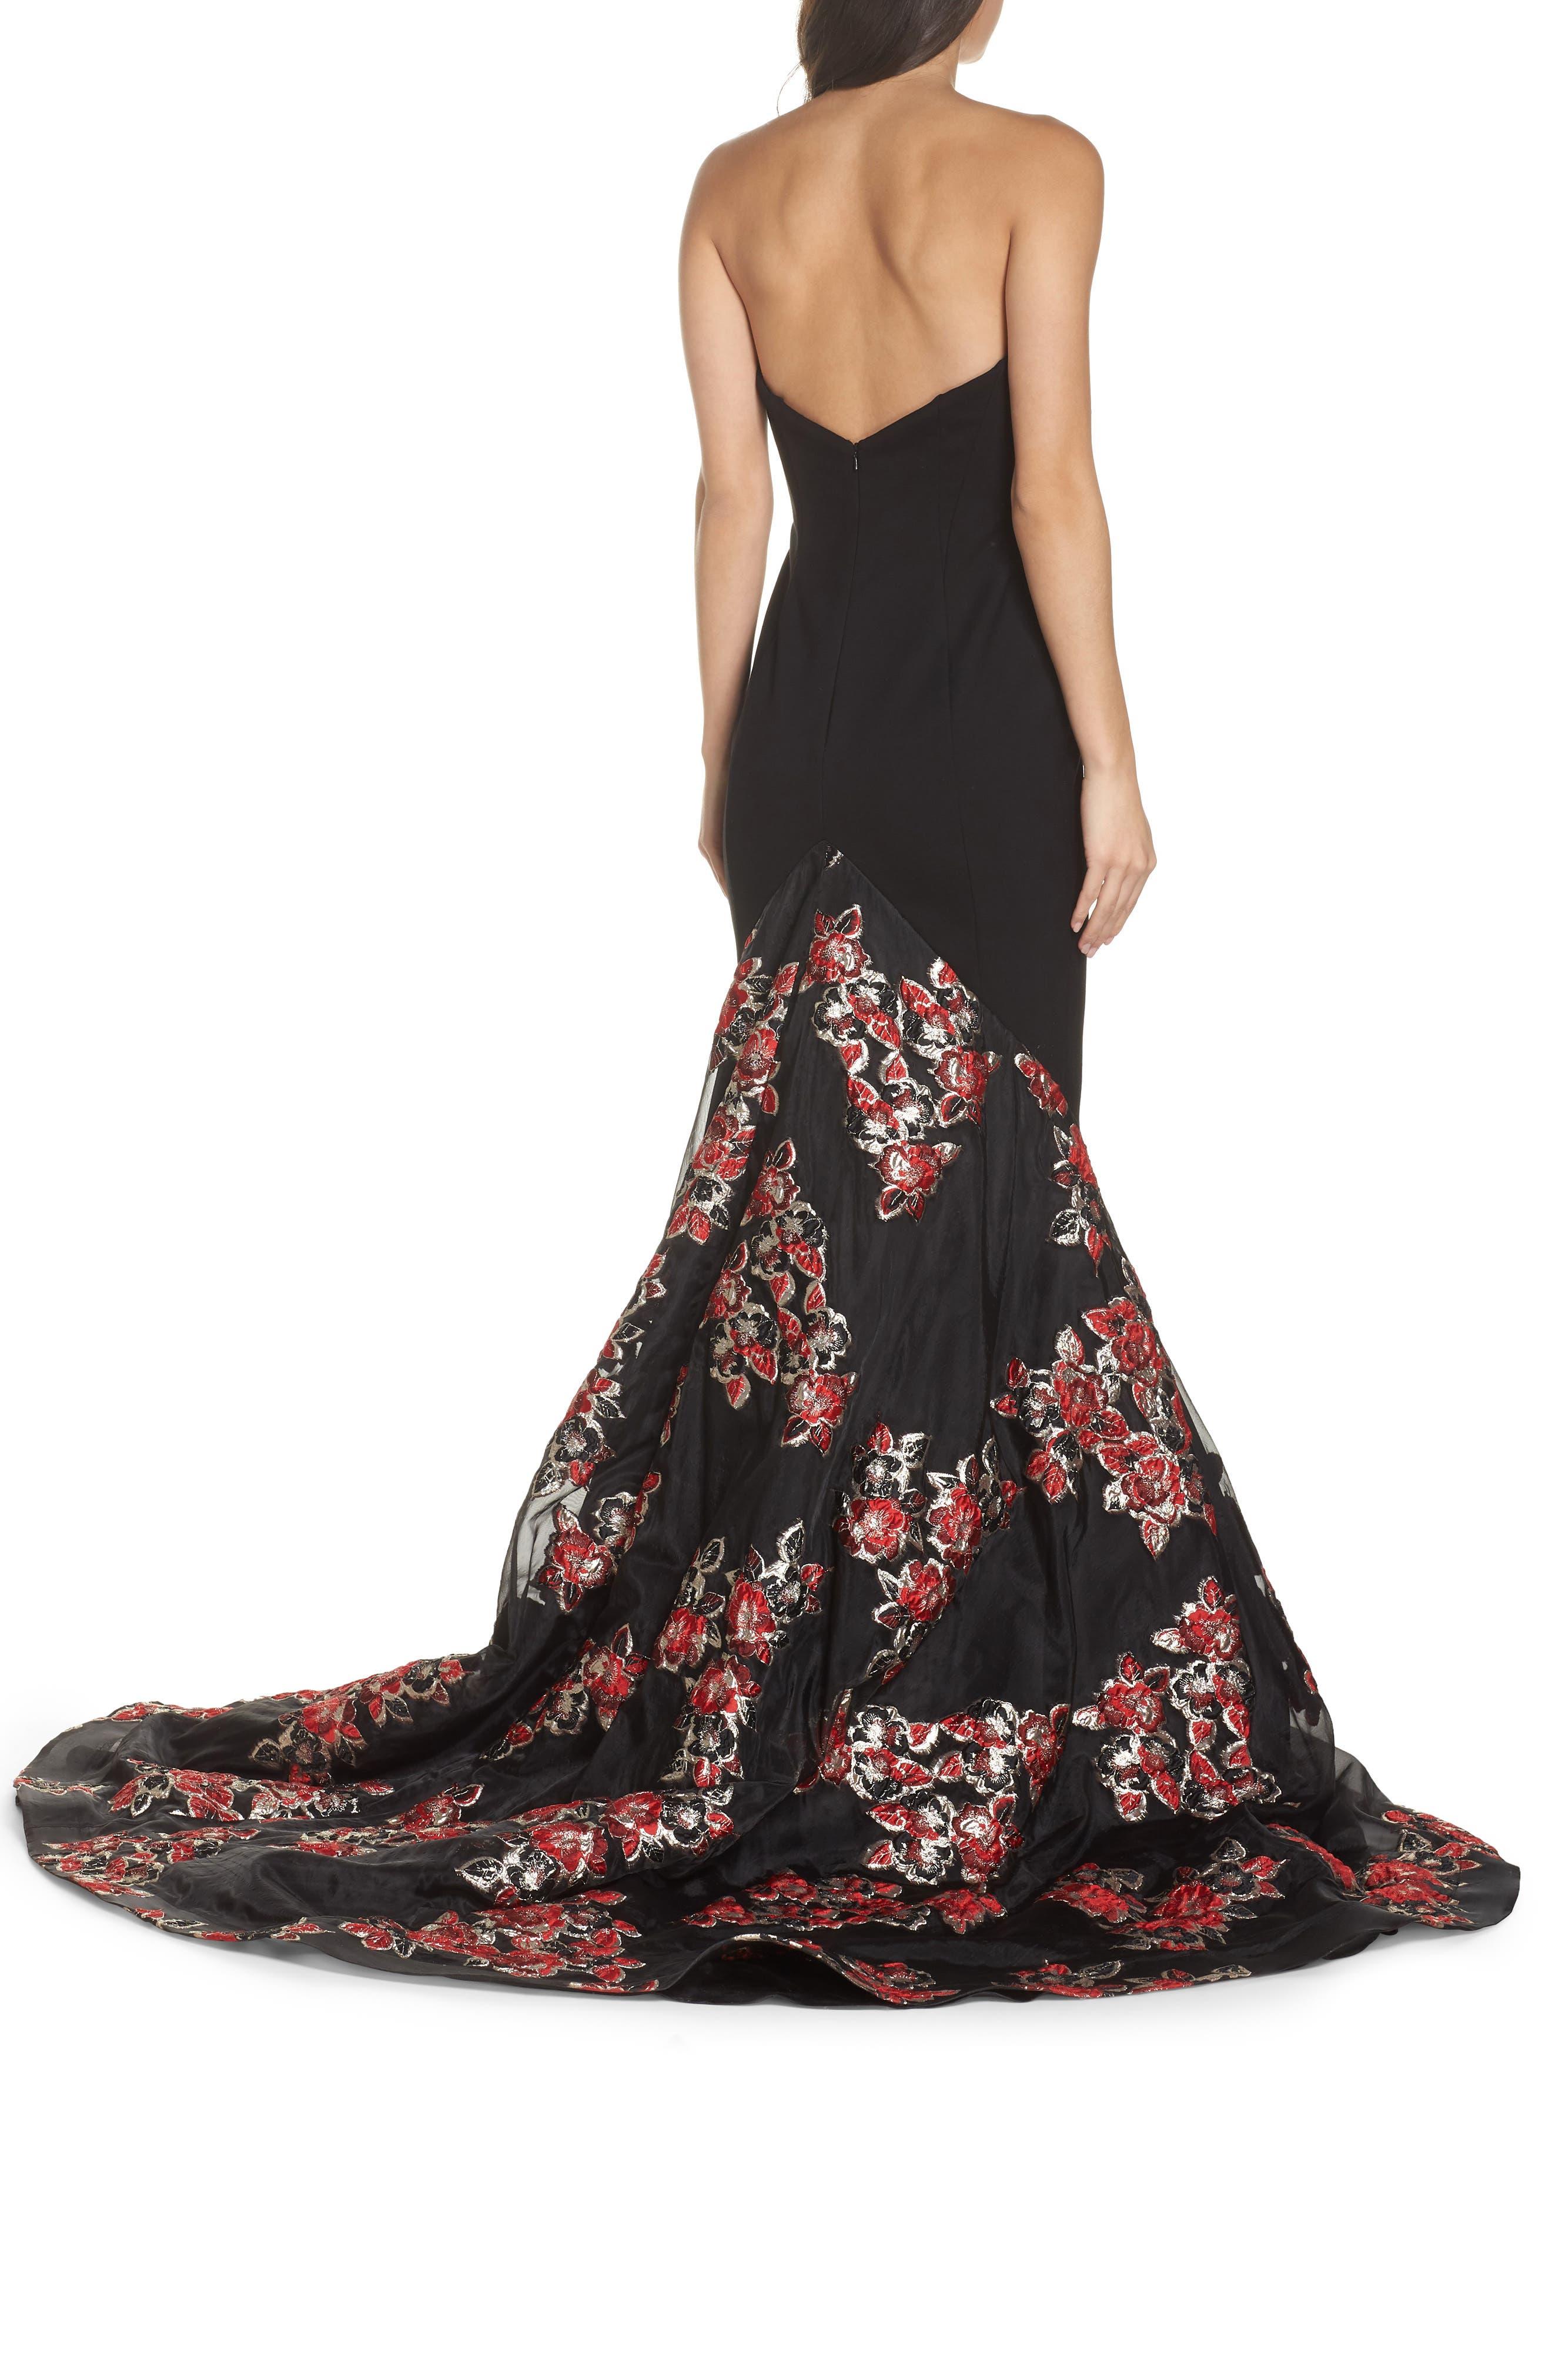 MAC DUGGAL, Plunge Floral Jacquard Mermaid Gown, Alternate thumbnail 2, color, BLACK